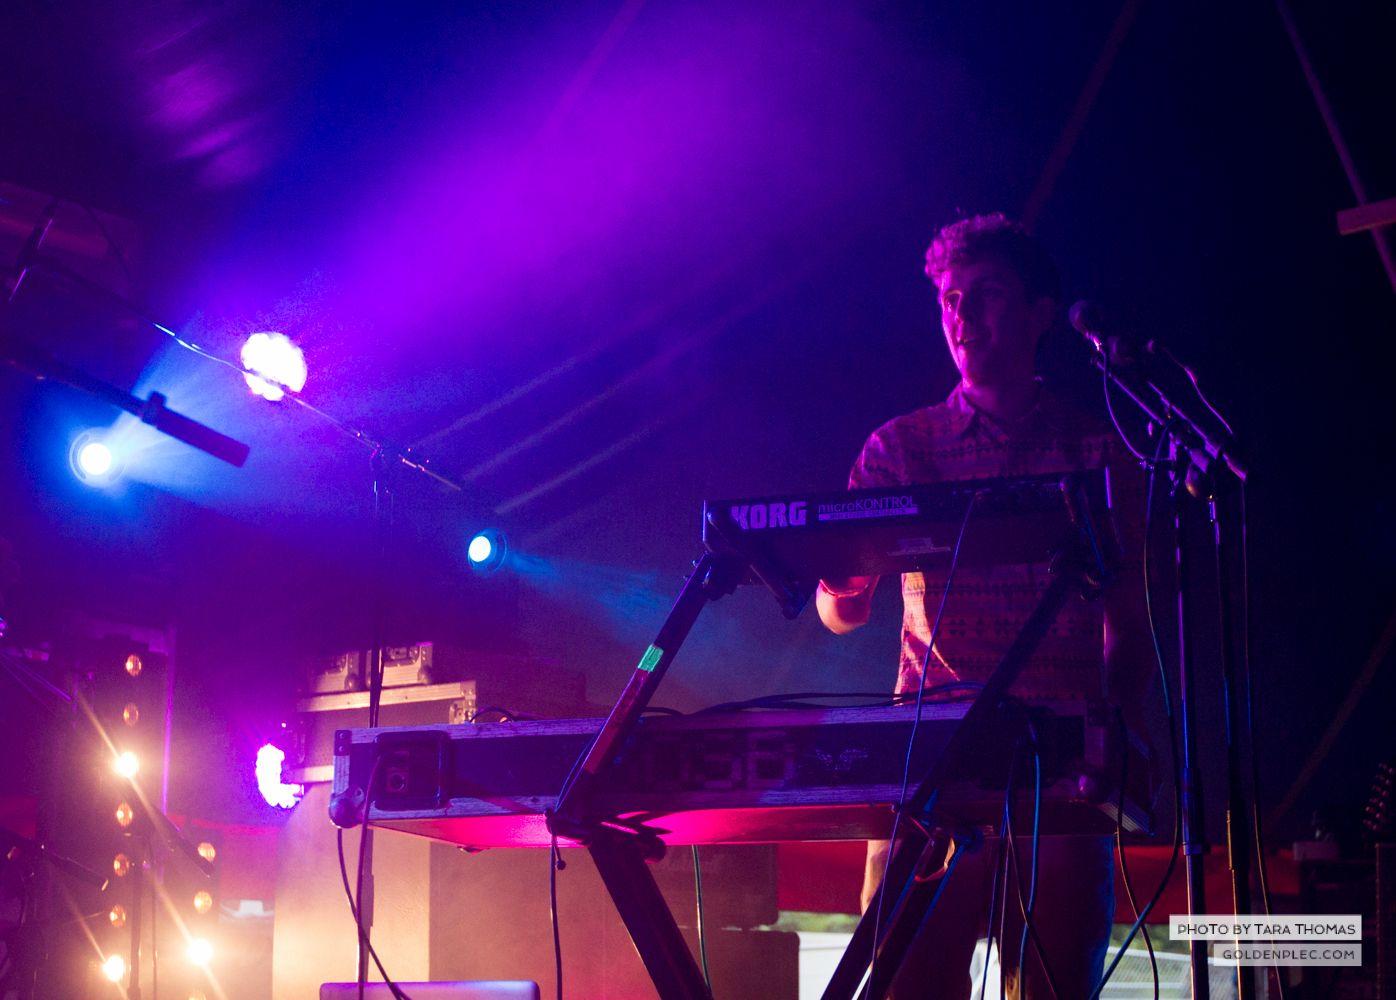 Sounds of the System Breakdown at Castlepalooza by Tara Thomas